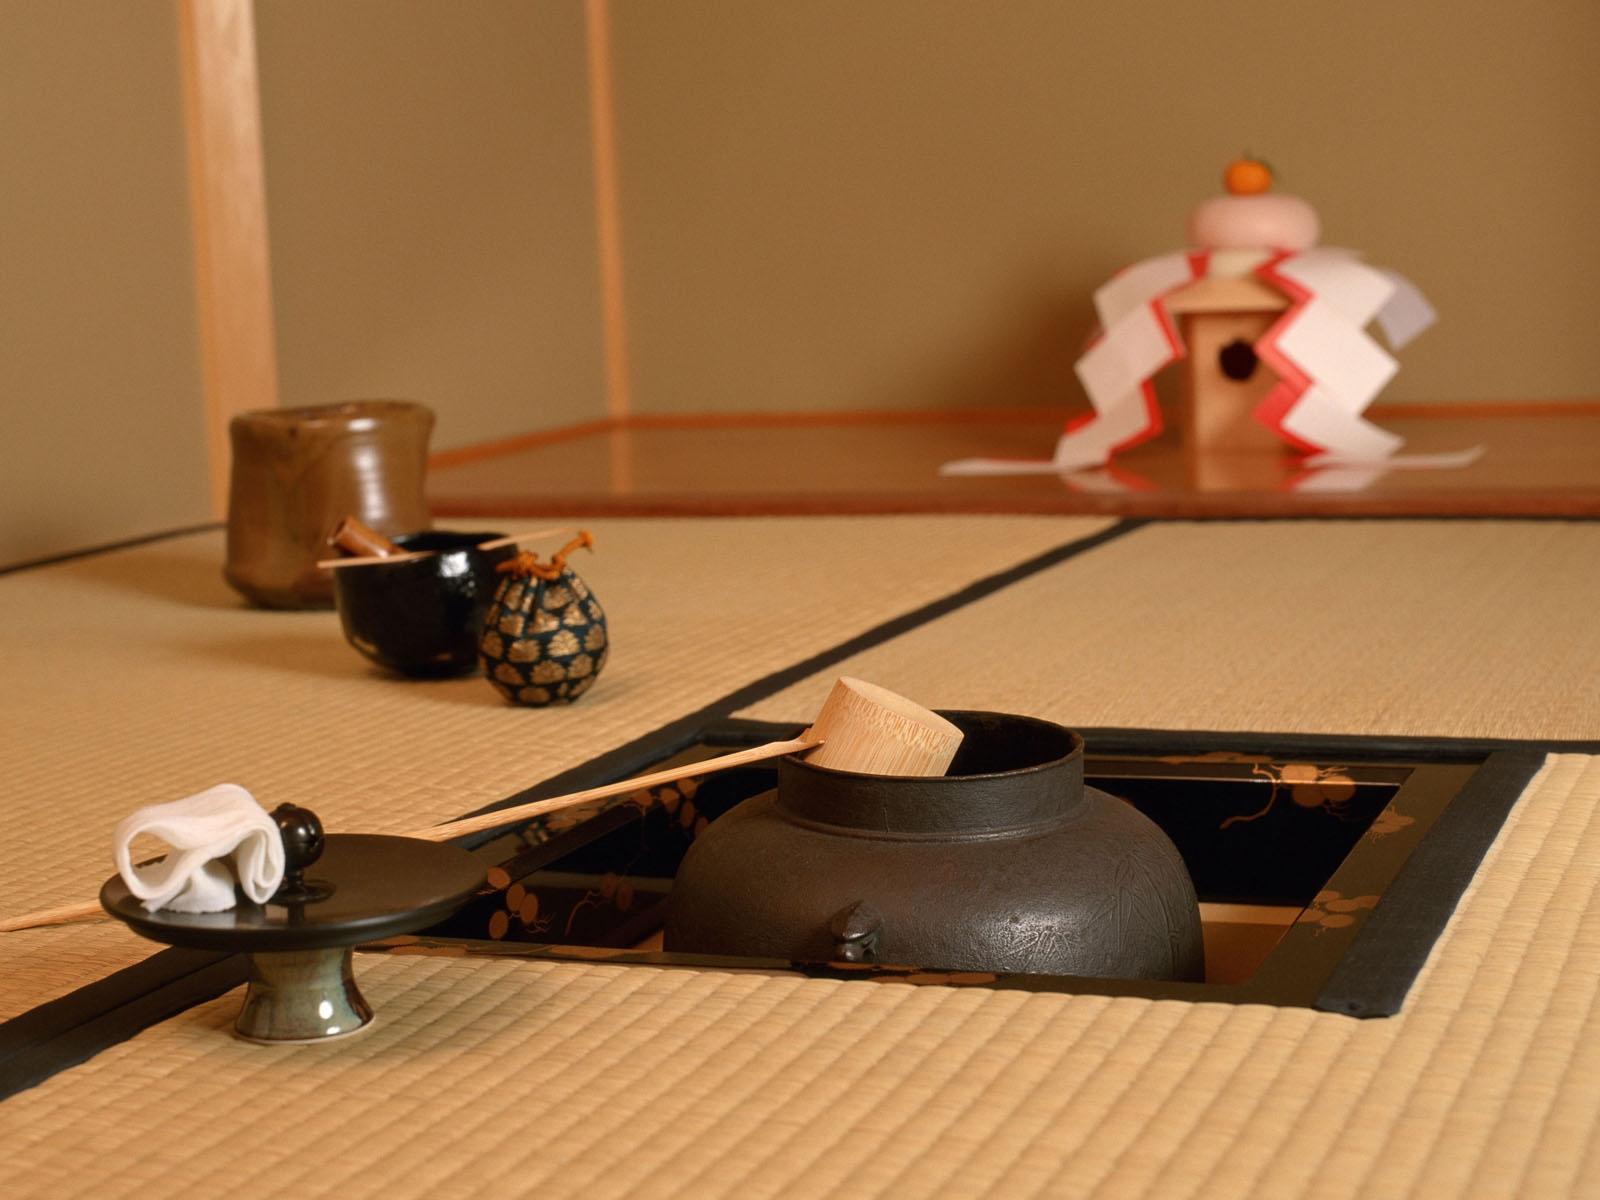 hintergrundbilder : japan, lebensmittel, tabelle, holz, haus, tee